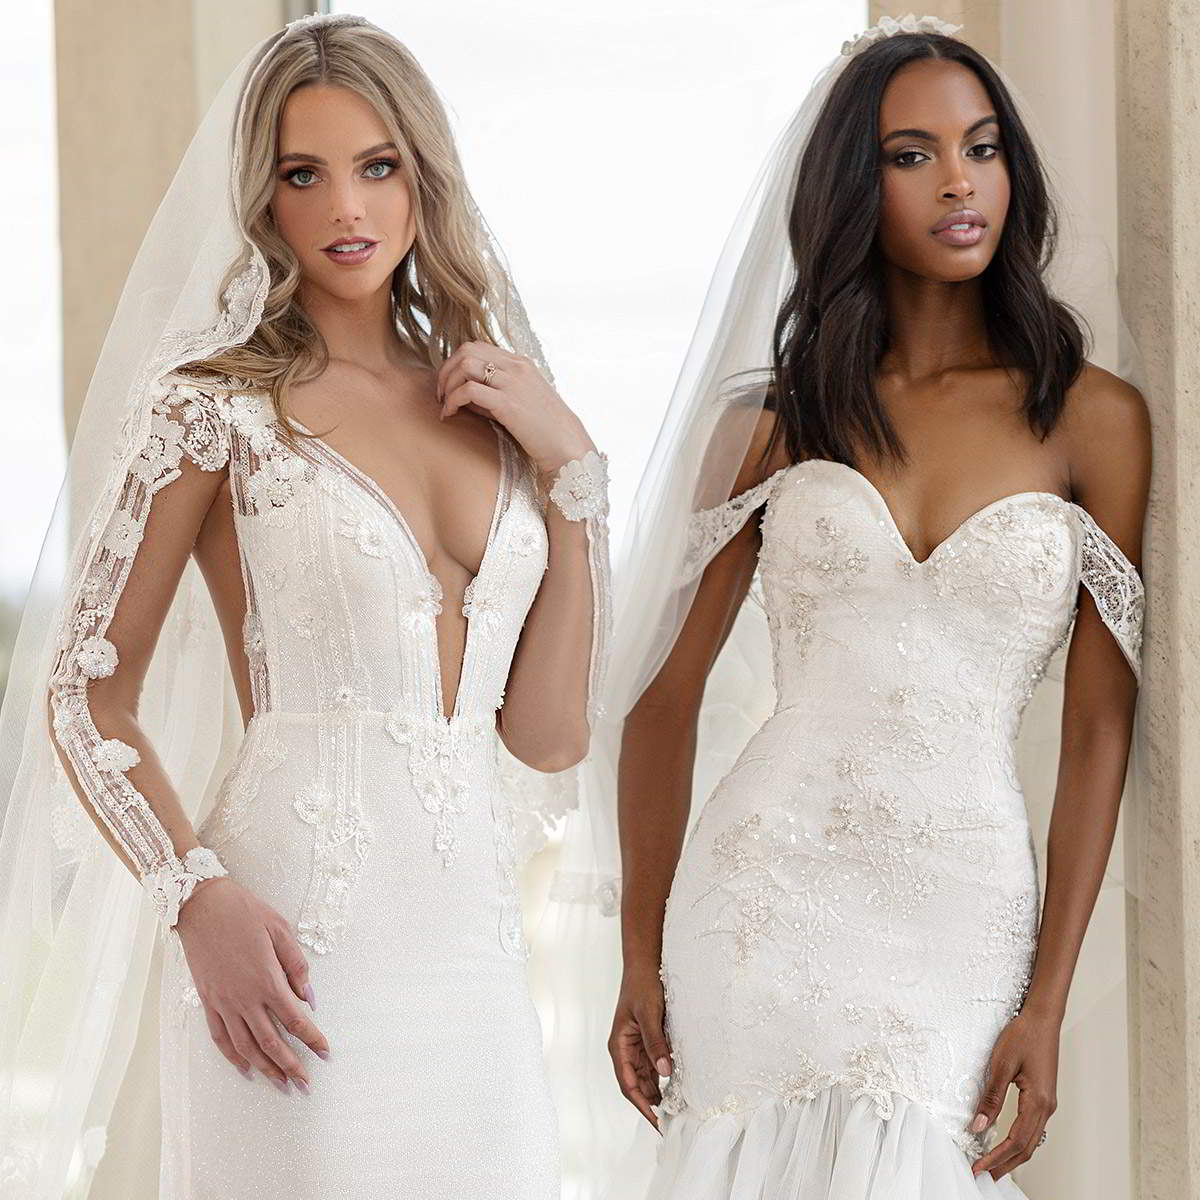 naama anat spring 2020 knottinghill bridal collection featured on wedding inspirasi thumbnail